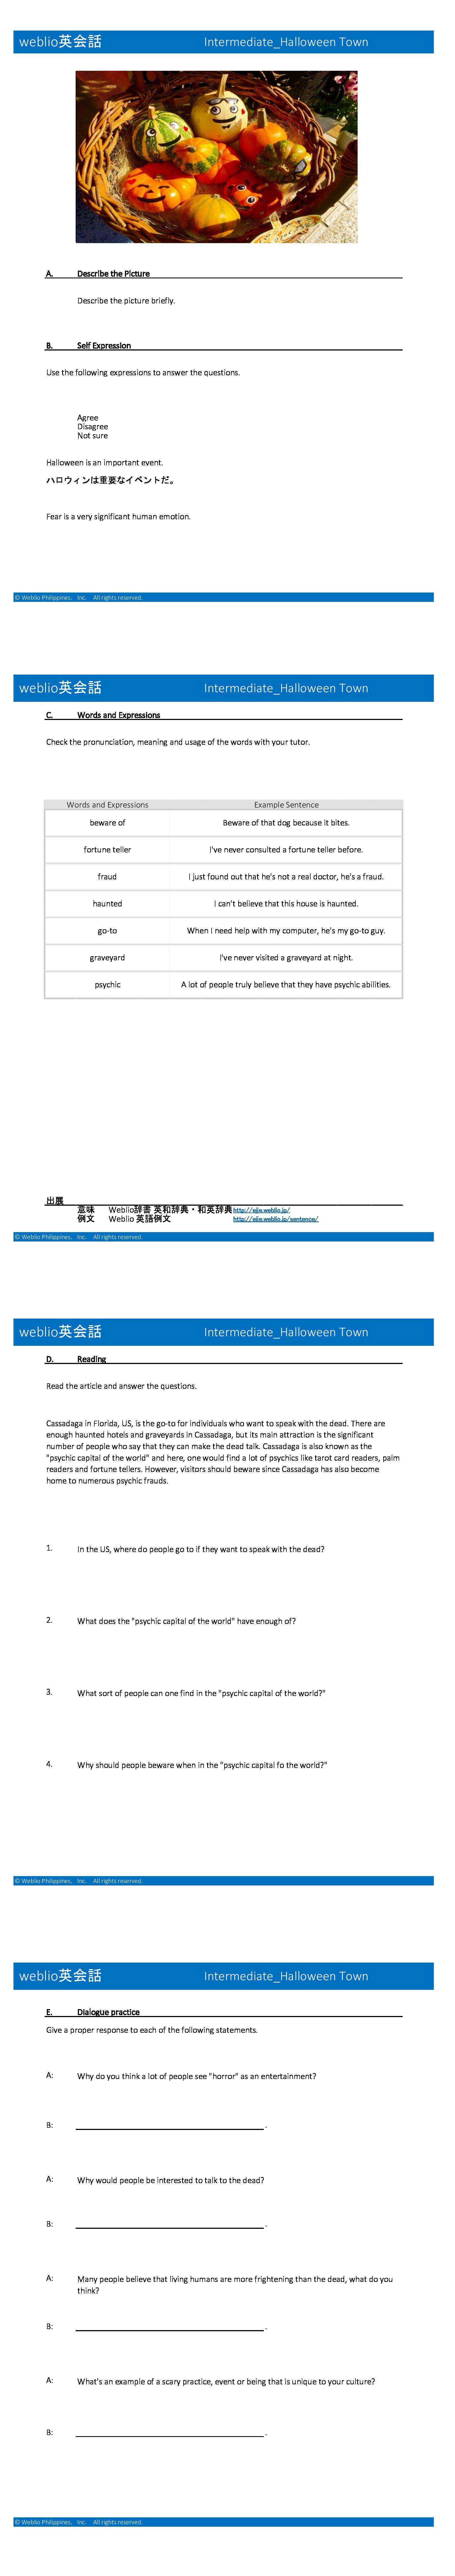 per-level-intermediate-halloween-town-en